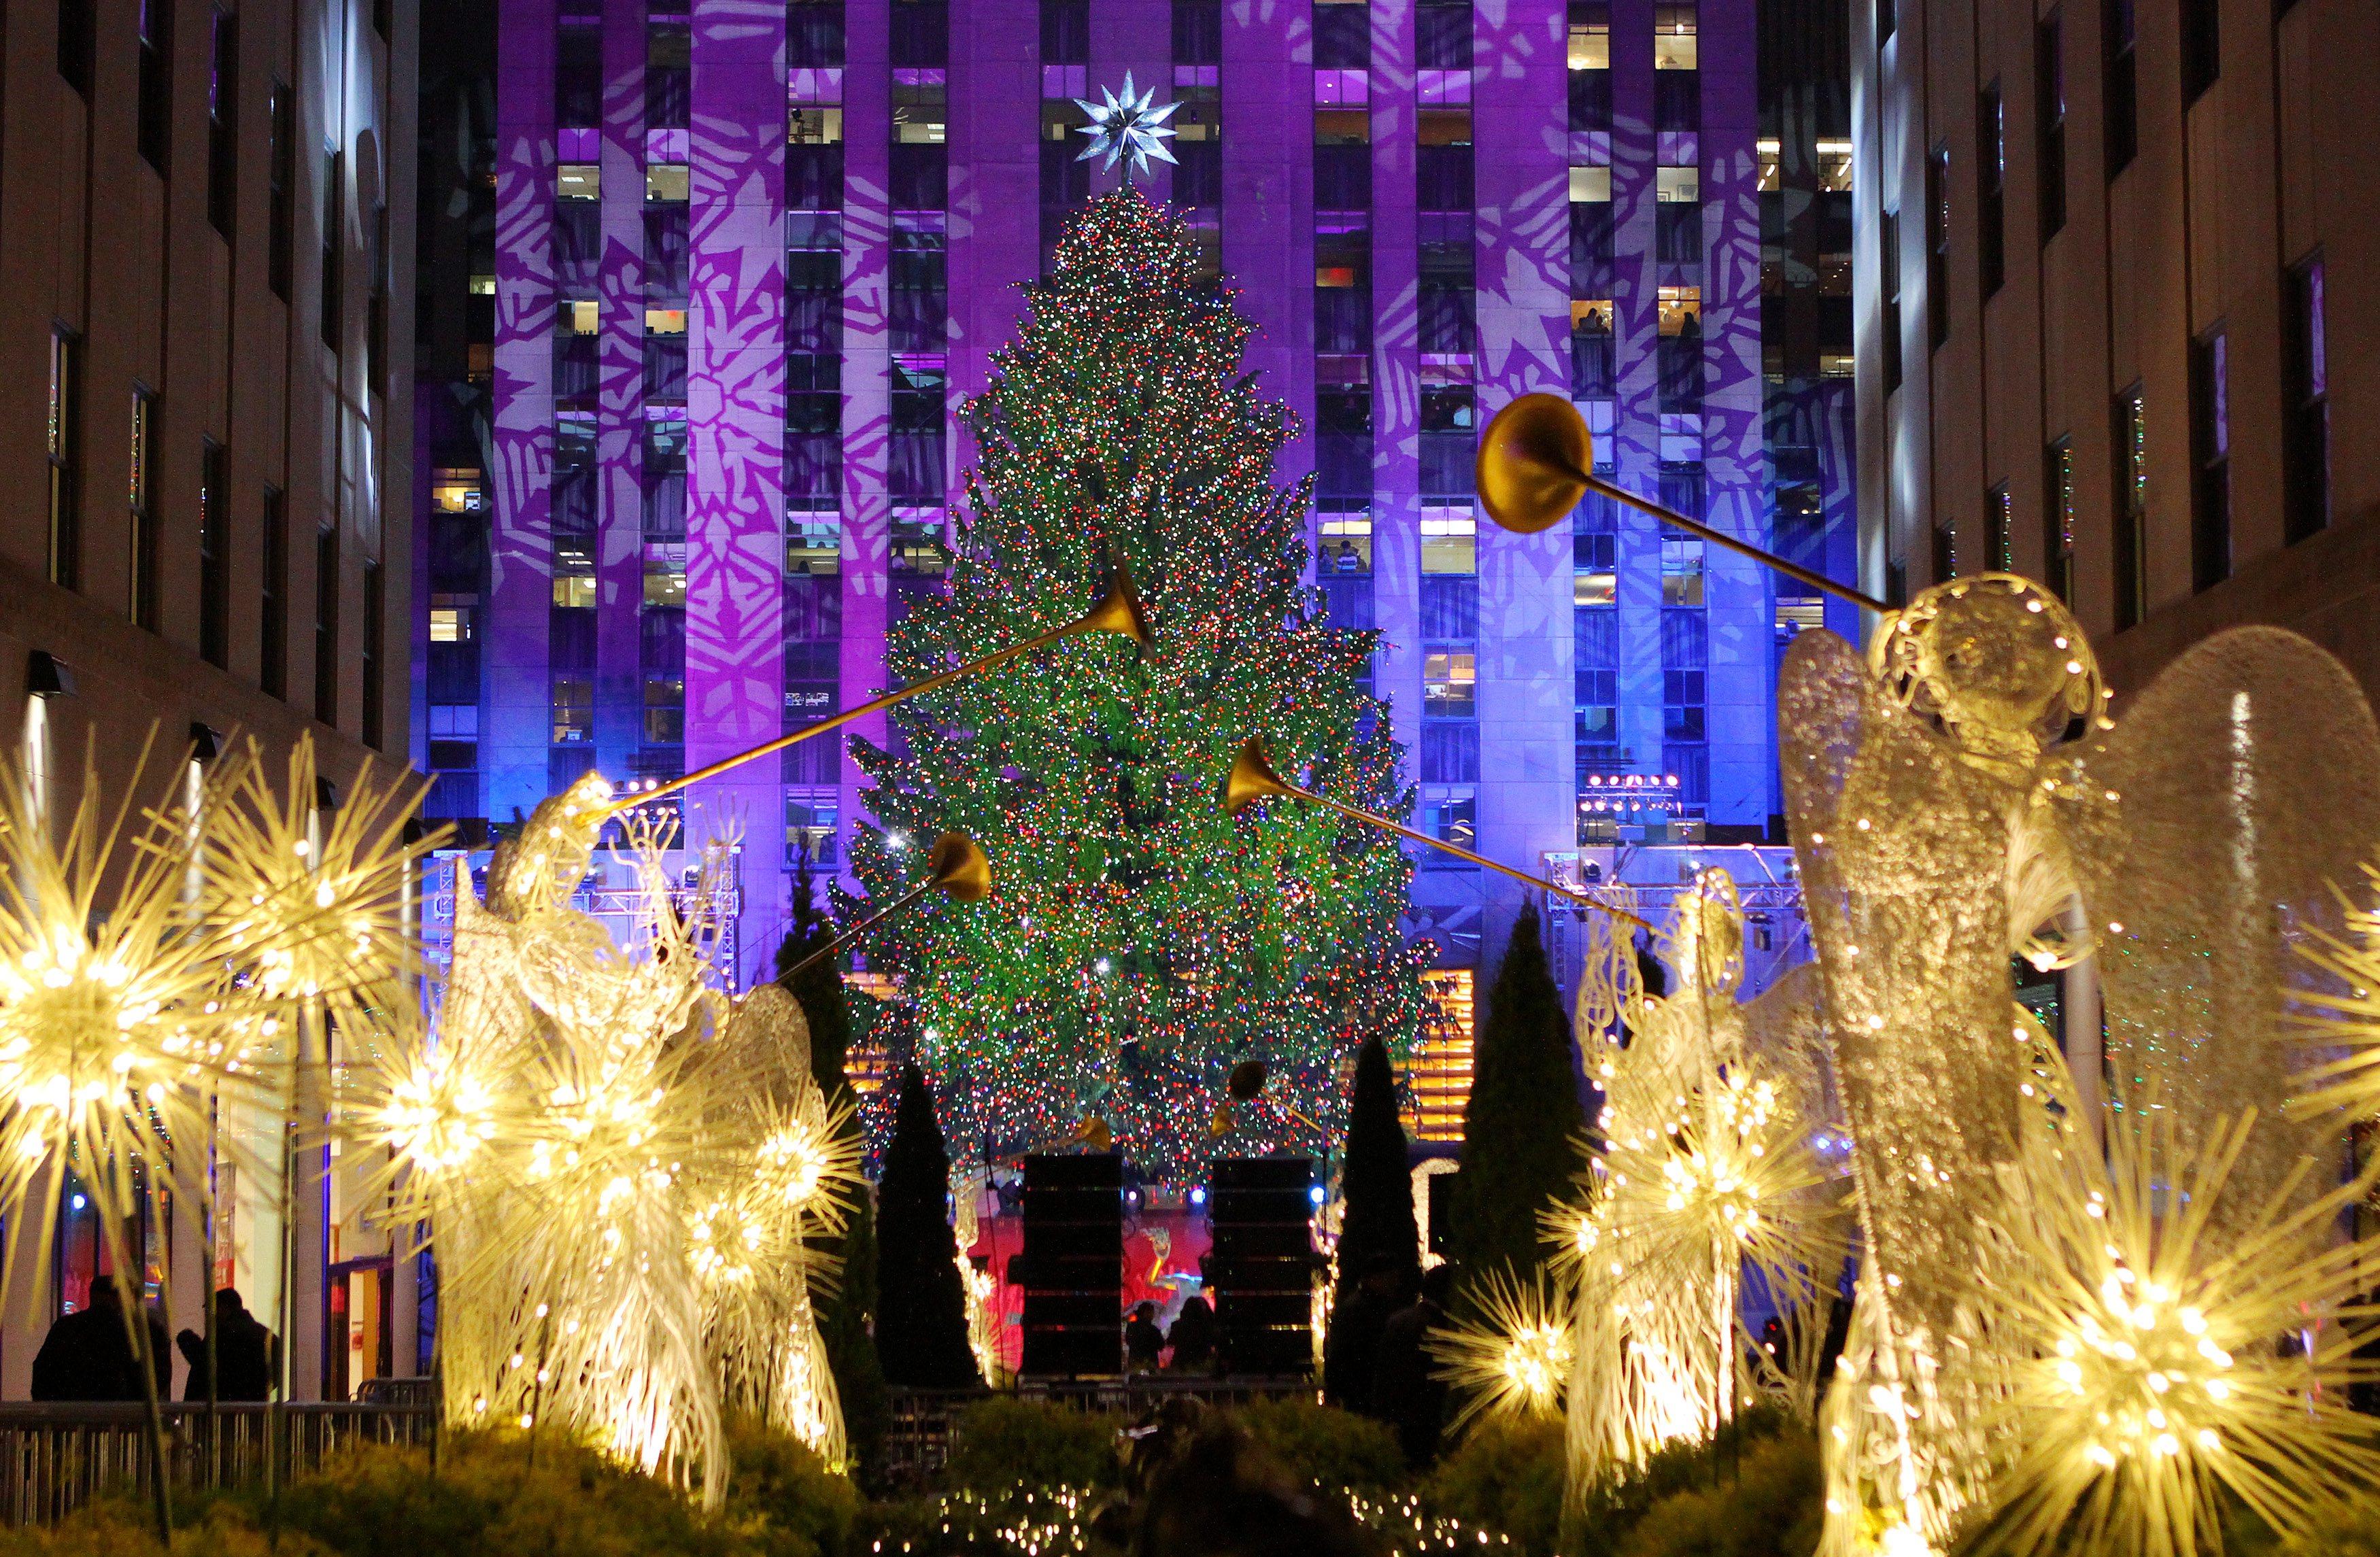 Frasi Natale Originali.Auguri Di Natale 2018 Le Frasi Piu Originali E Simpatiche Per Amici